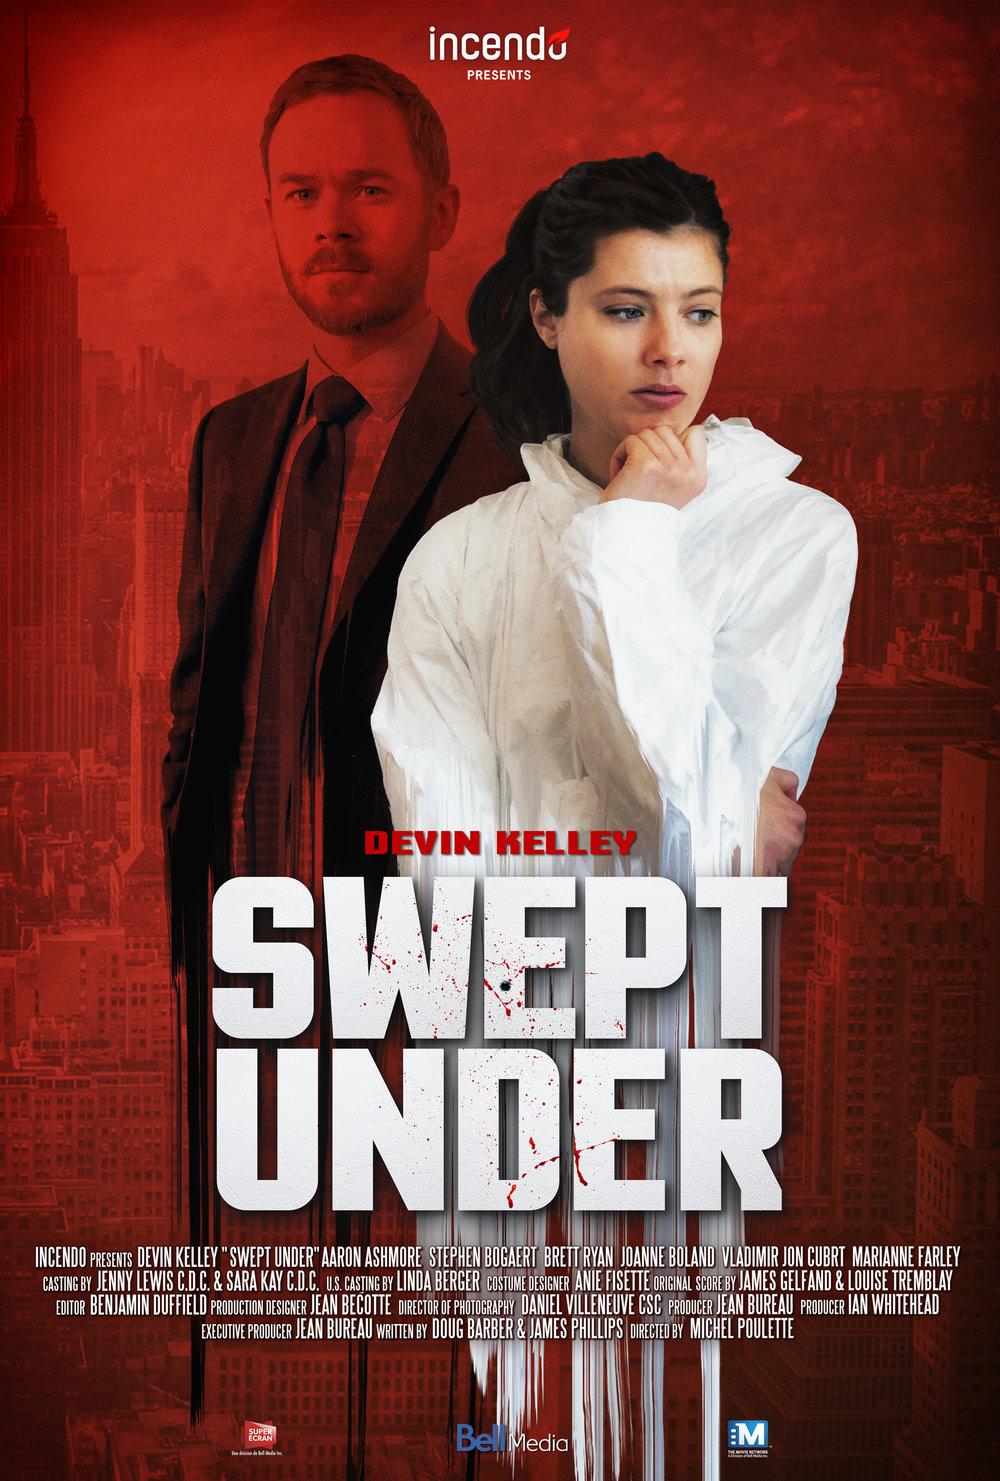 Swept-under-final-(sponsor-size)-1620x2400-@72-dpi.jpg